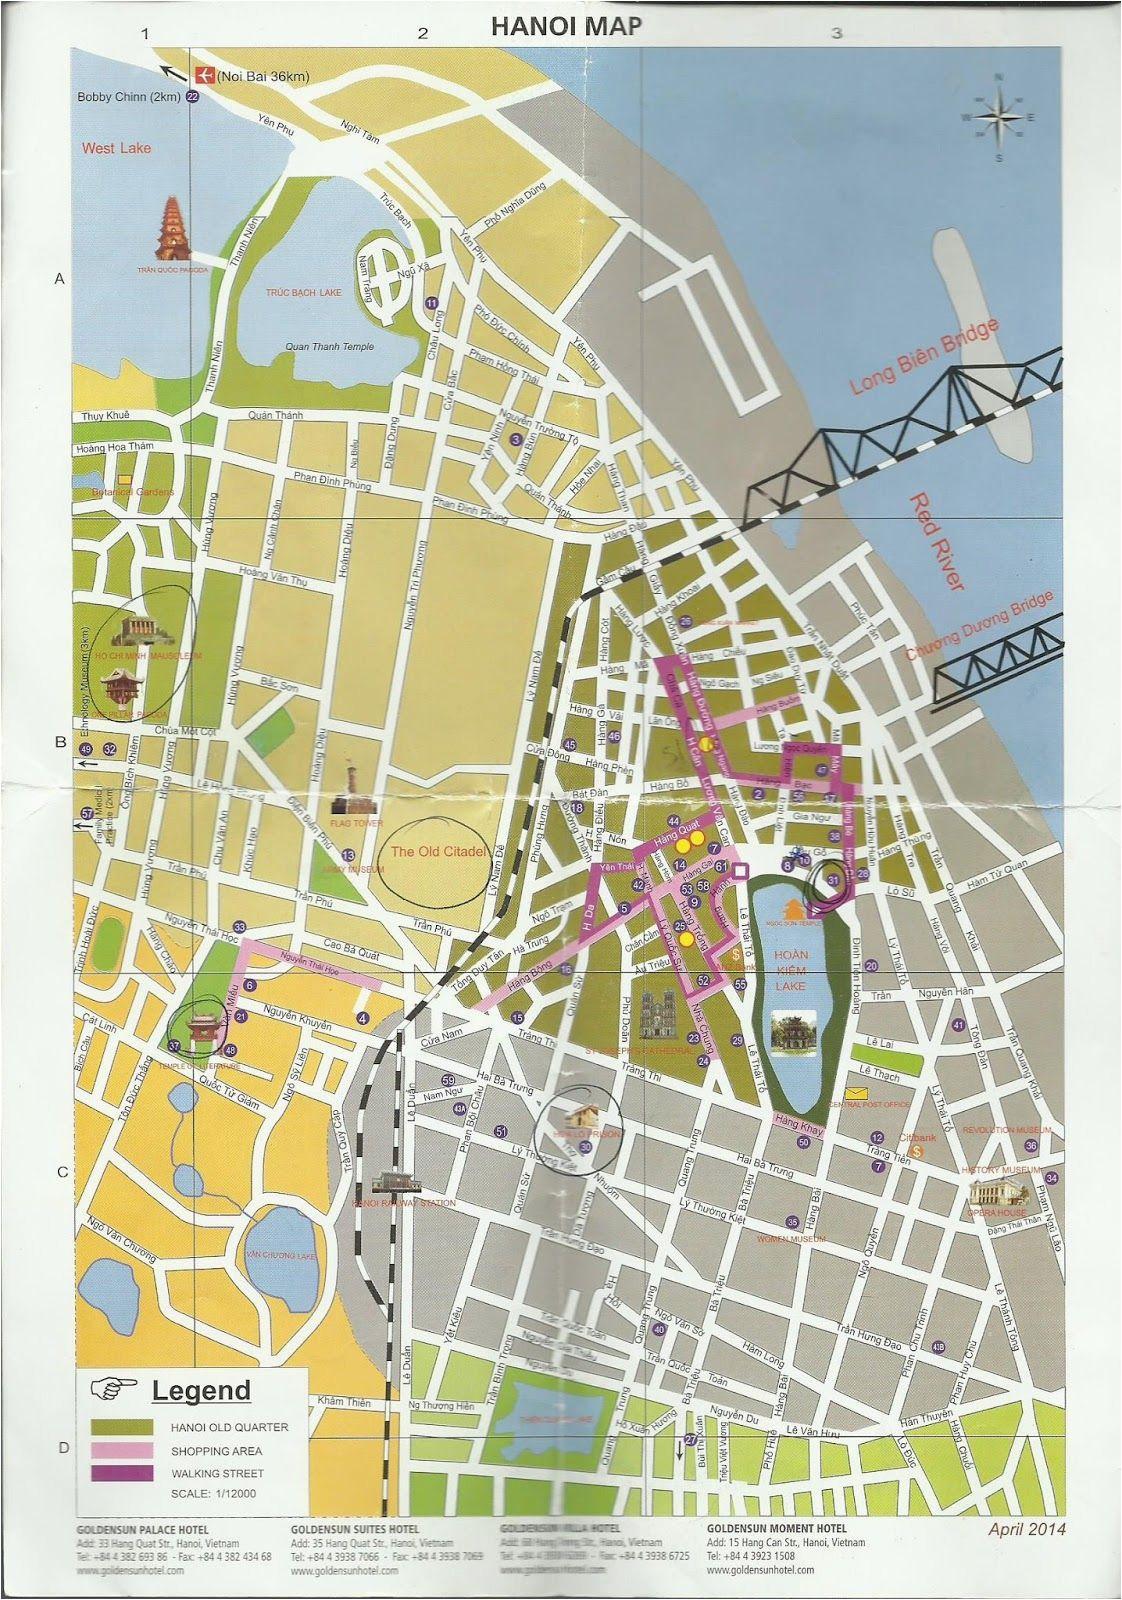 hanoi tourist map vietnam tourist map hanoi vietnam vietnam